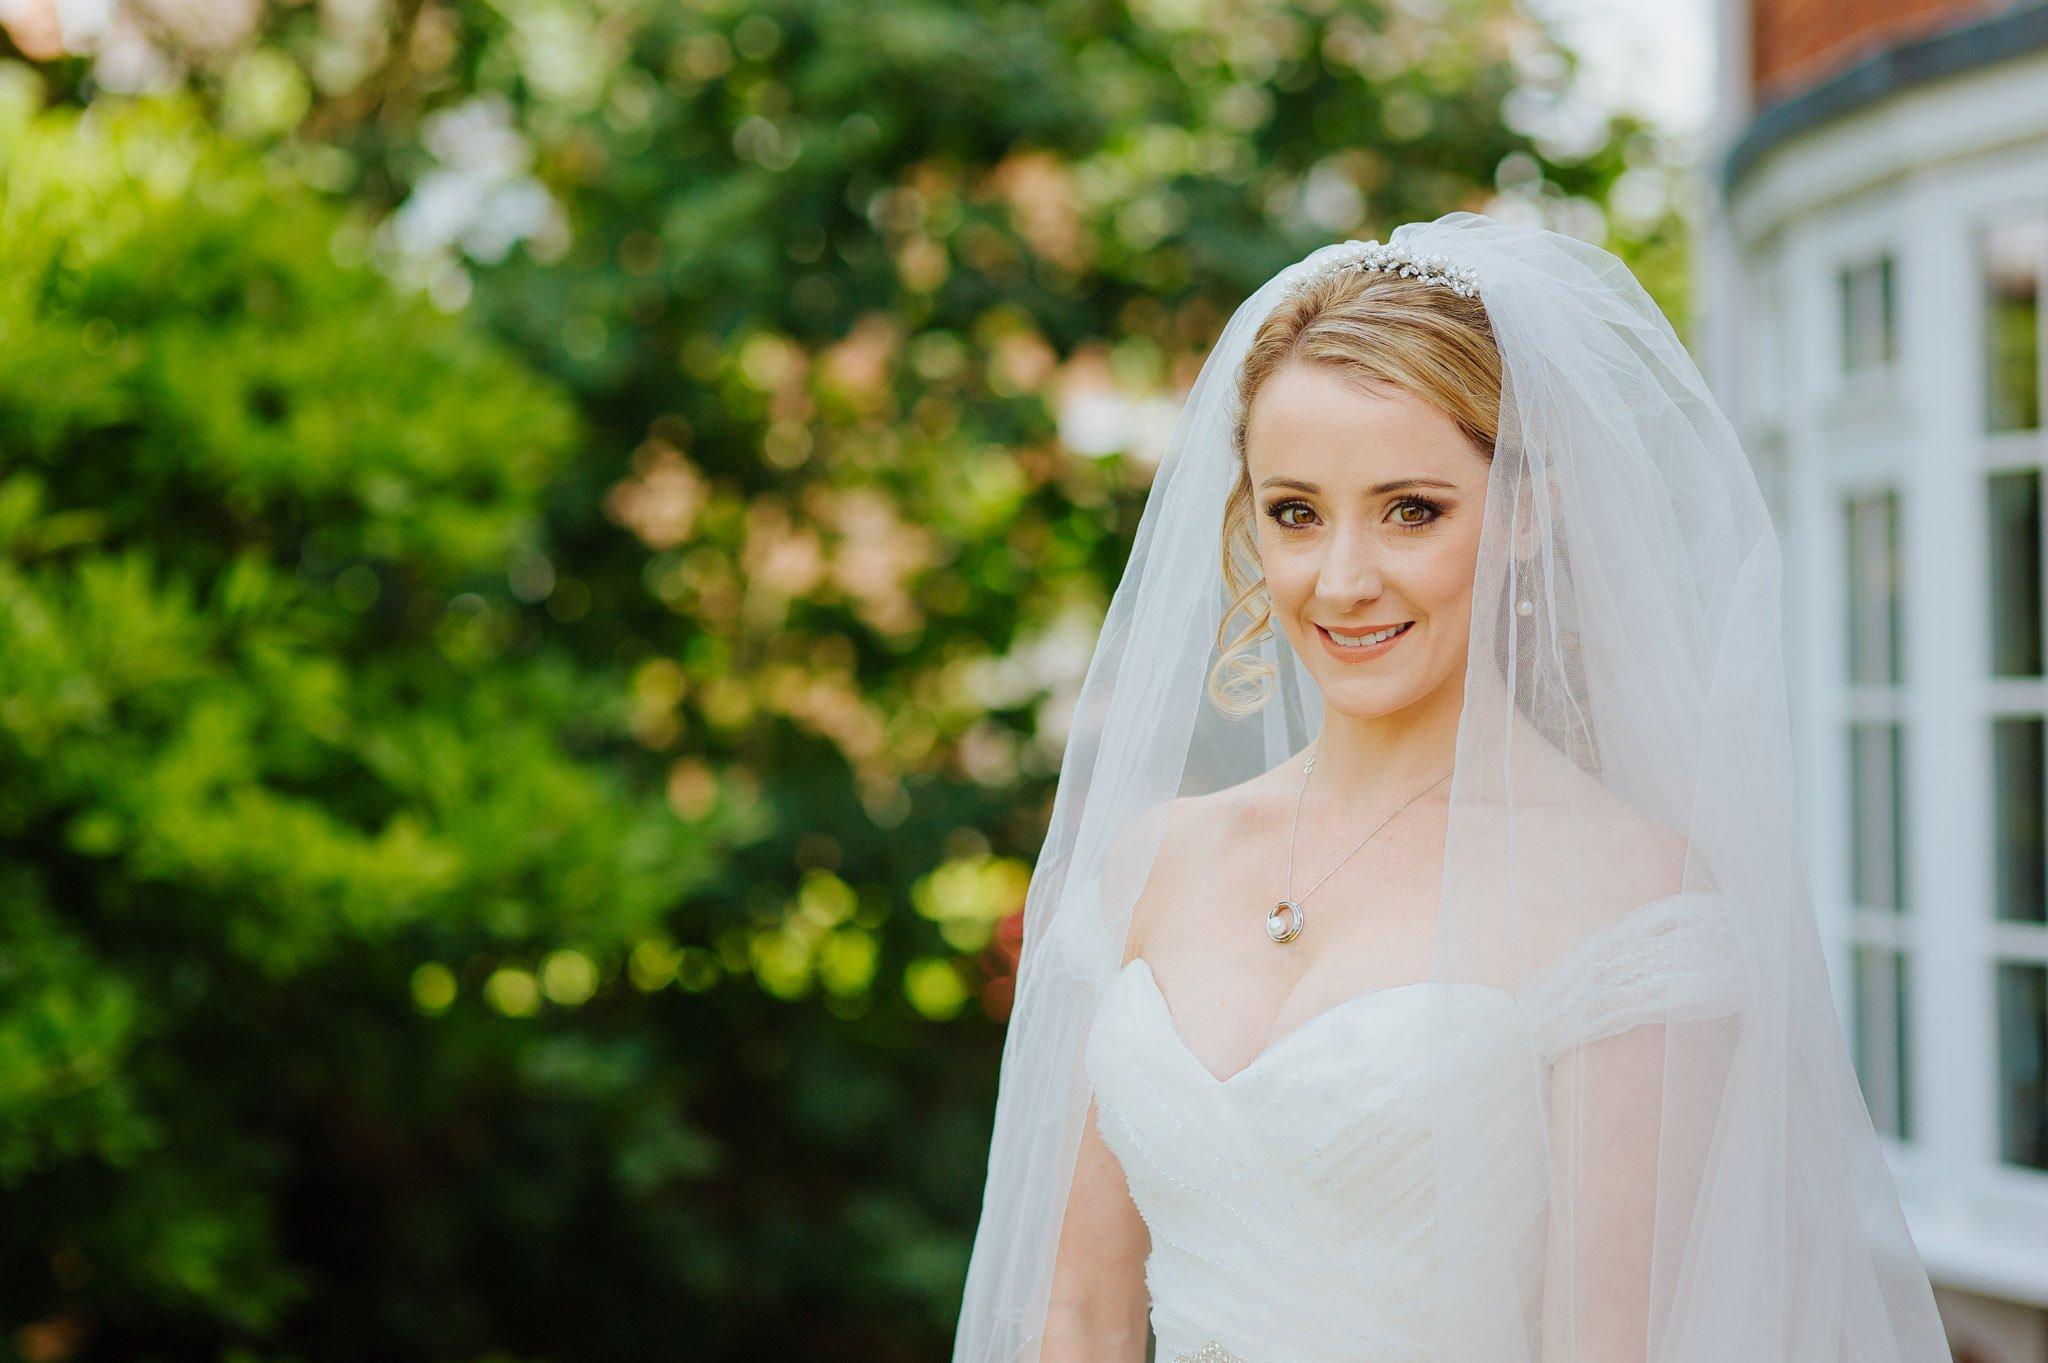 Georgina + Mike - Wedding photography in Malvern, Worcestershire 13